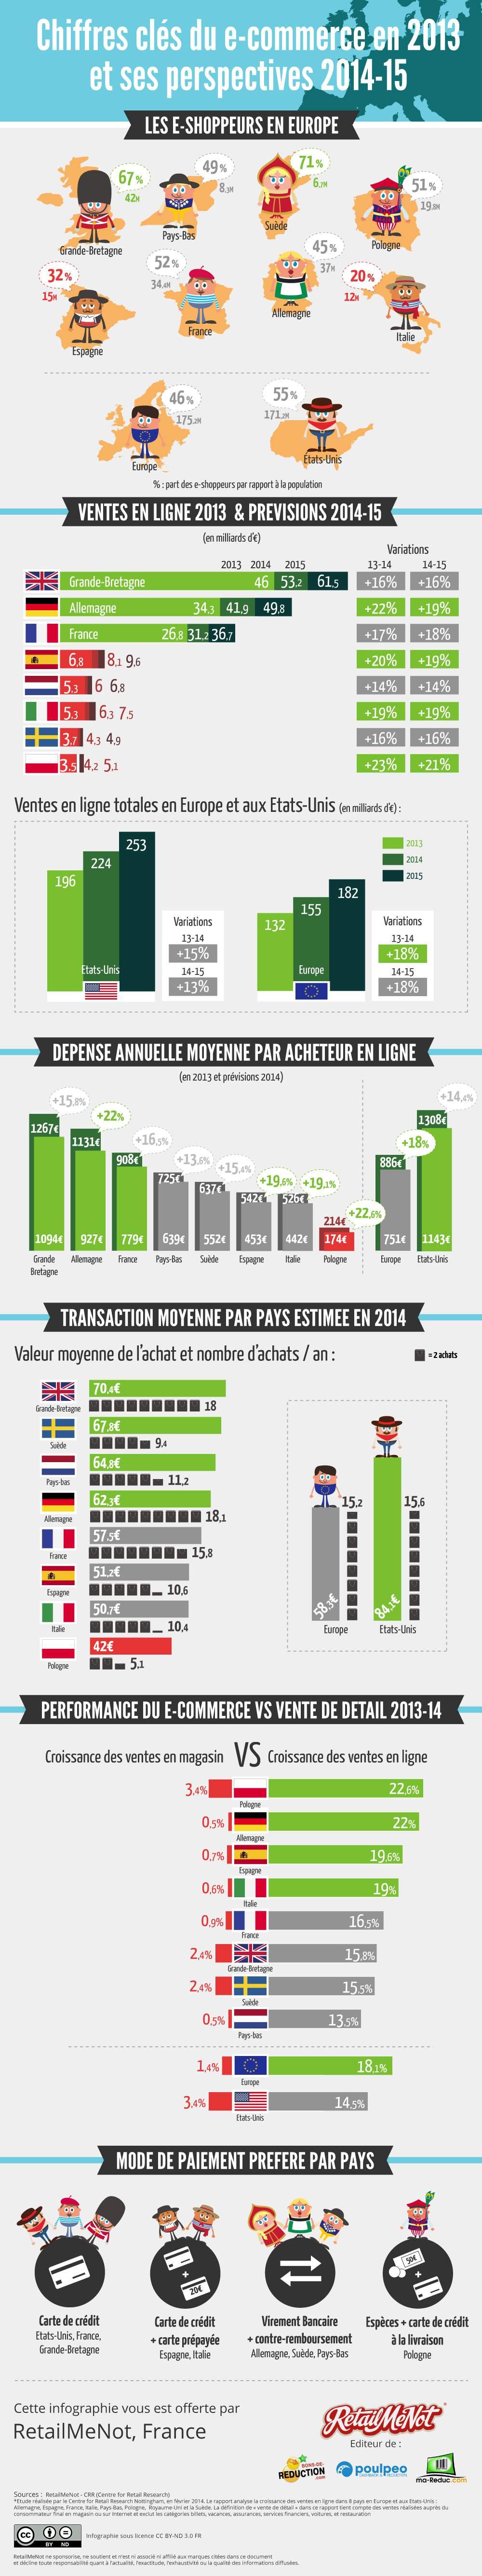 infografica ecommerce 2014 2015